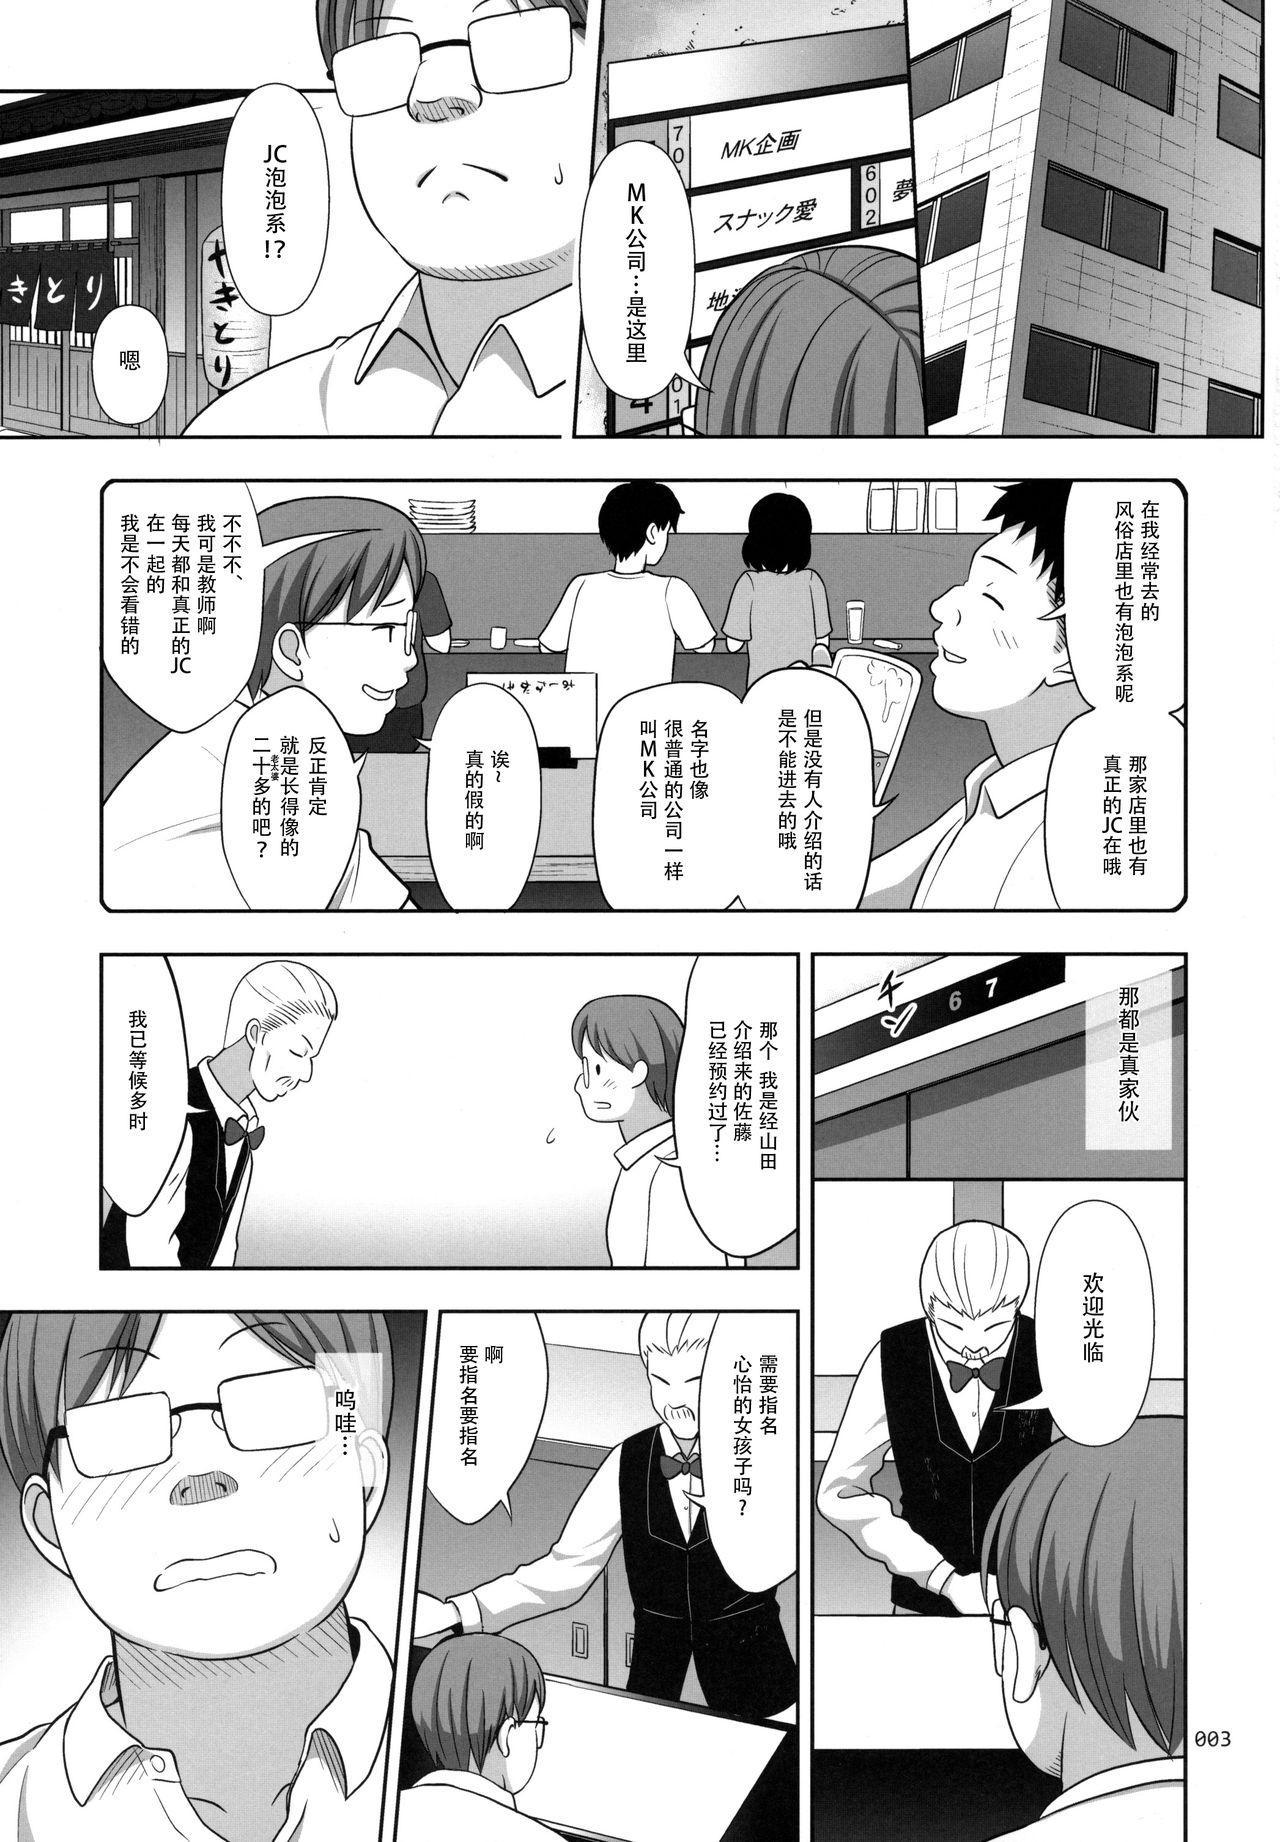 JC na Shoujo no Ehon 2